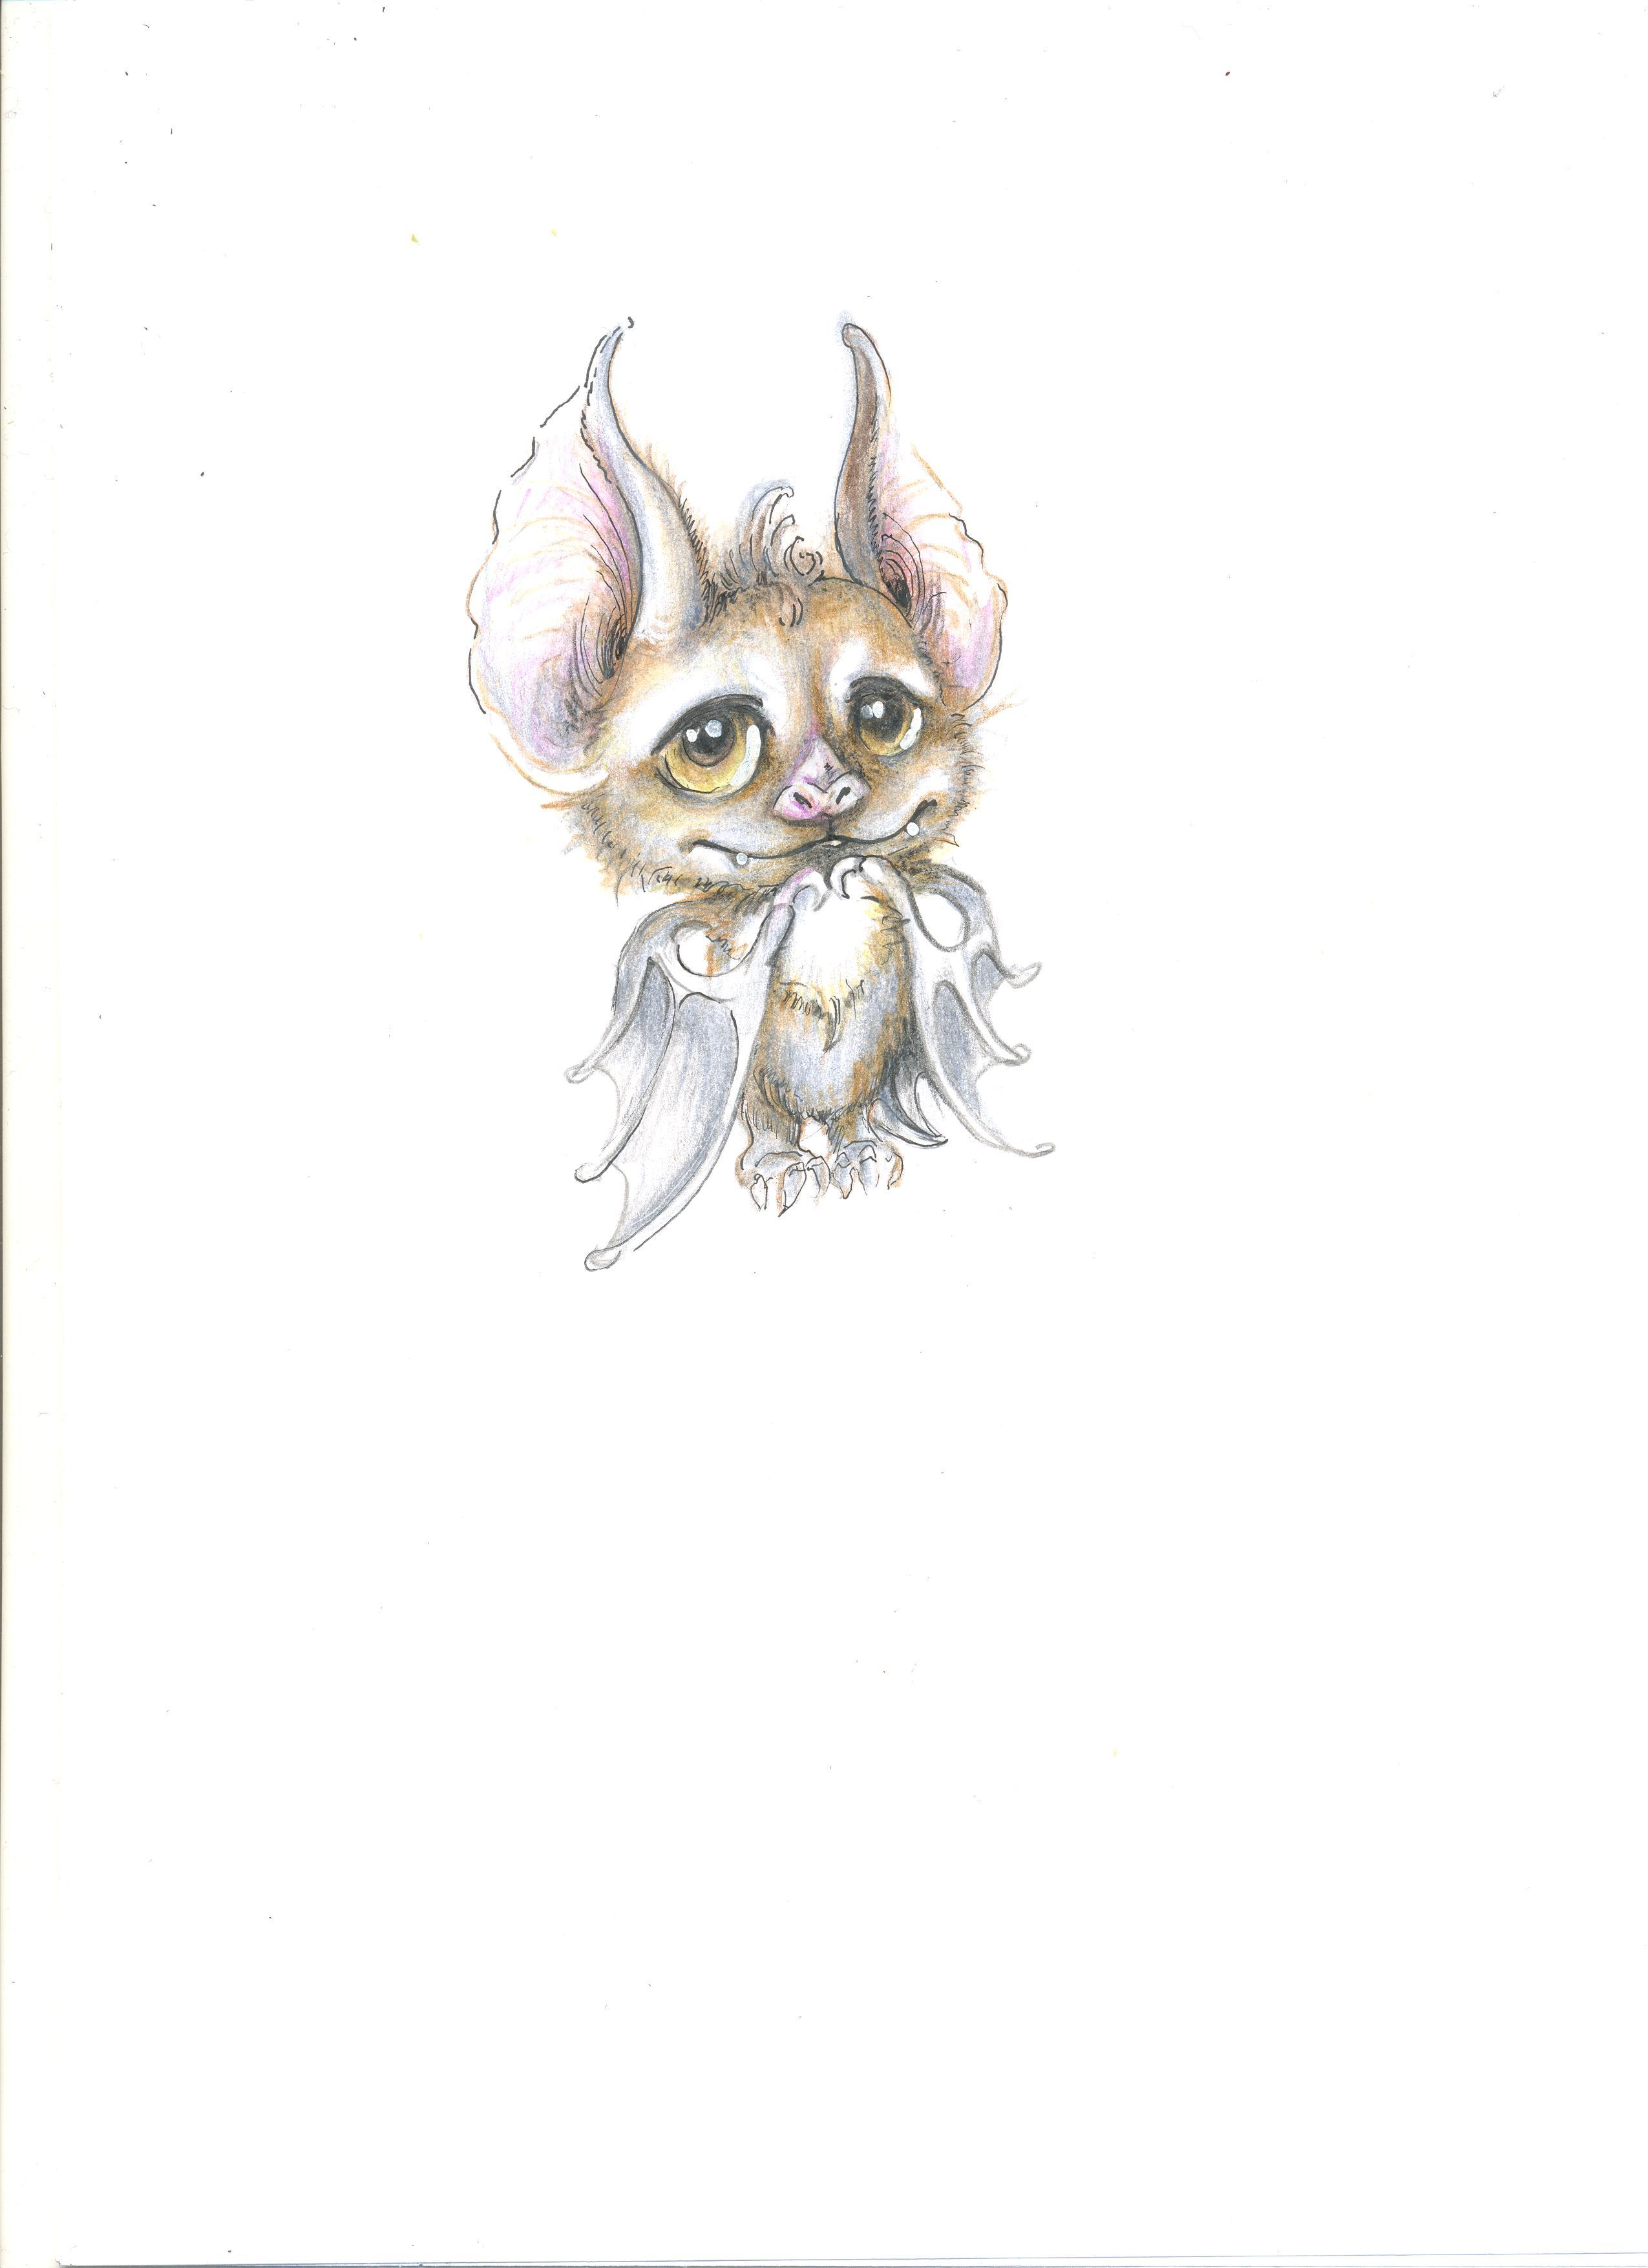 Нарисовать персонажа для анимации фото f_3235c8b35c22f09e.jpg